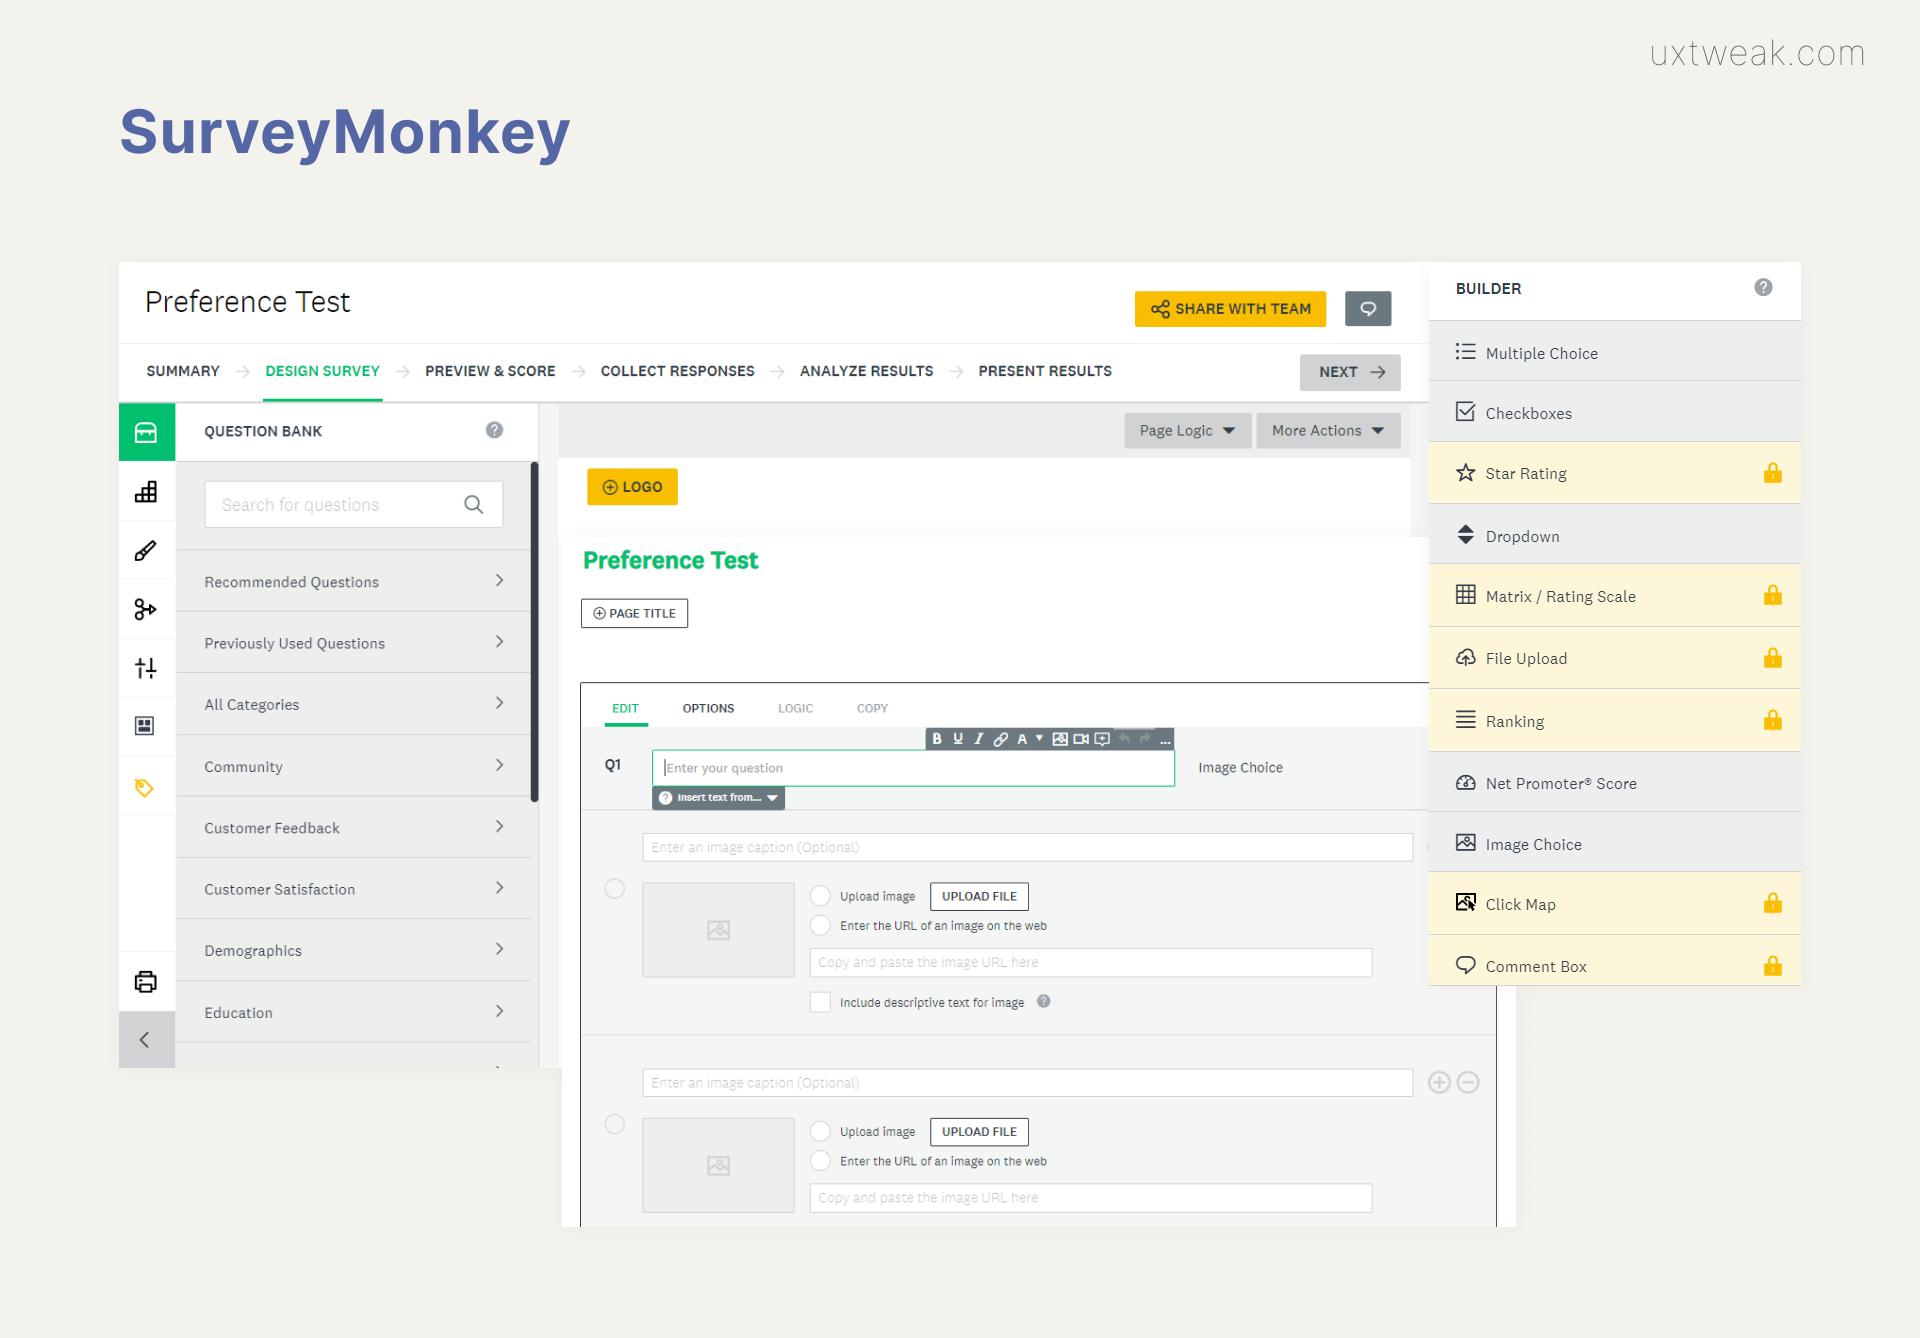 Survey Monkey preference testing tool